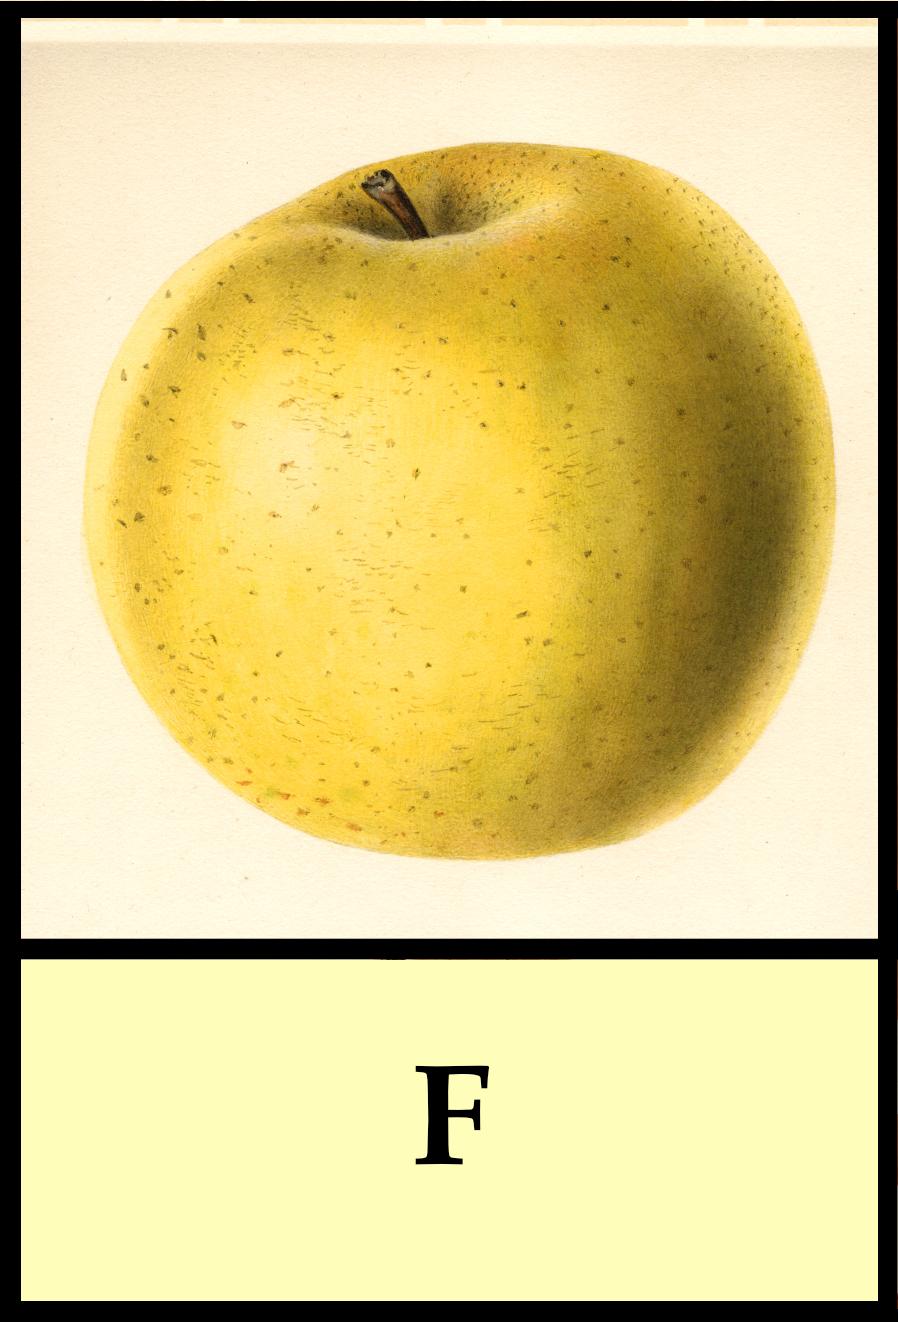 F apples